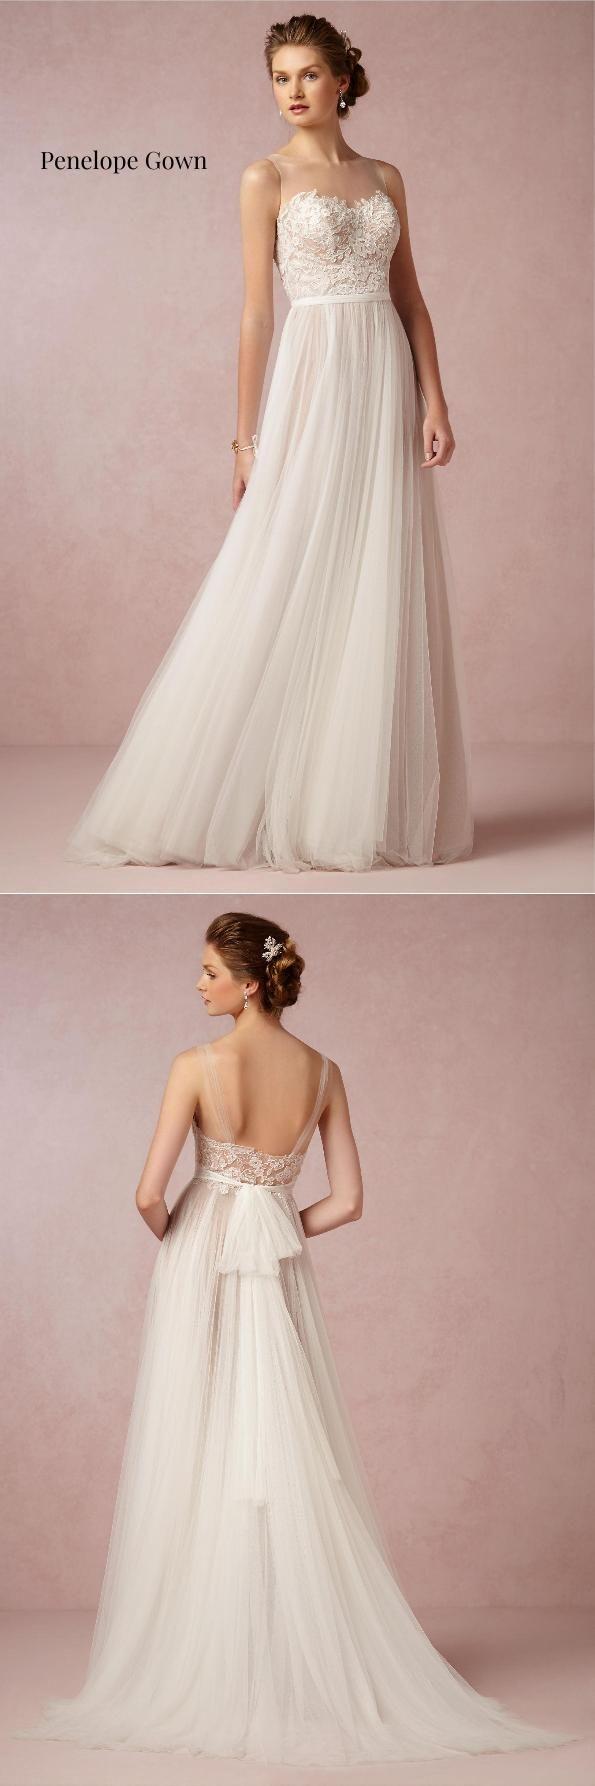 10 Must-See Wedding Dresses Under $1000 | Mujeres hermosas, Hermosa ...